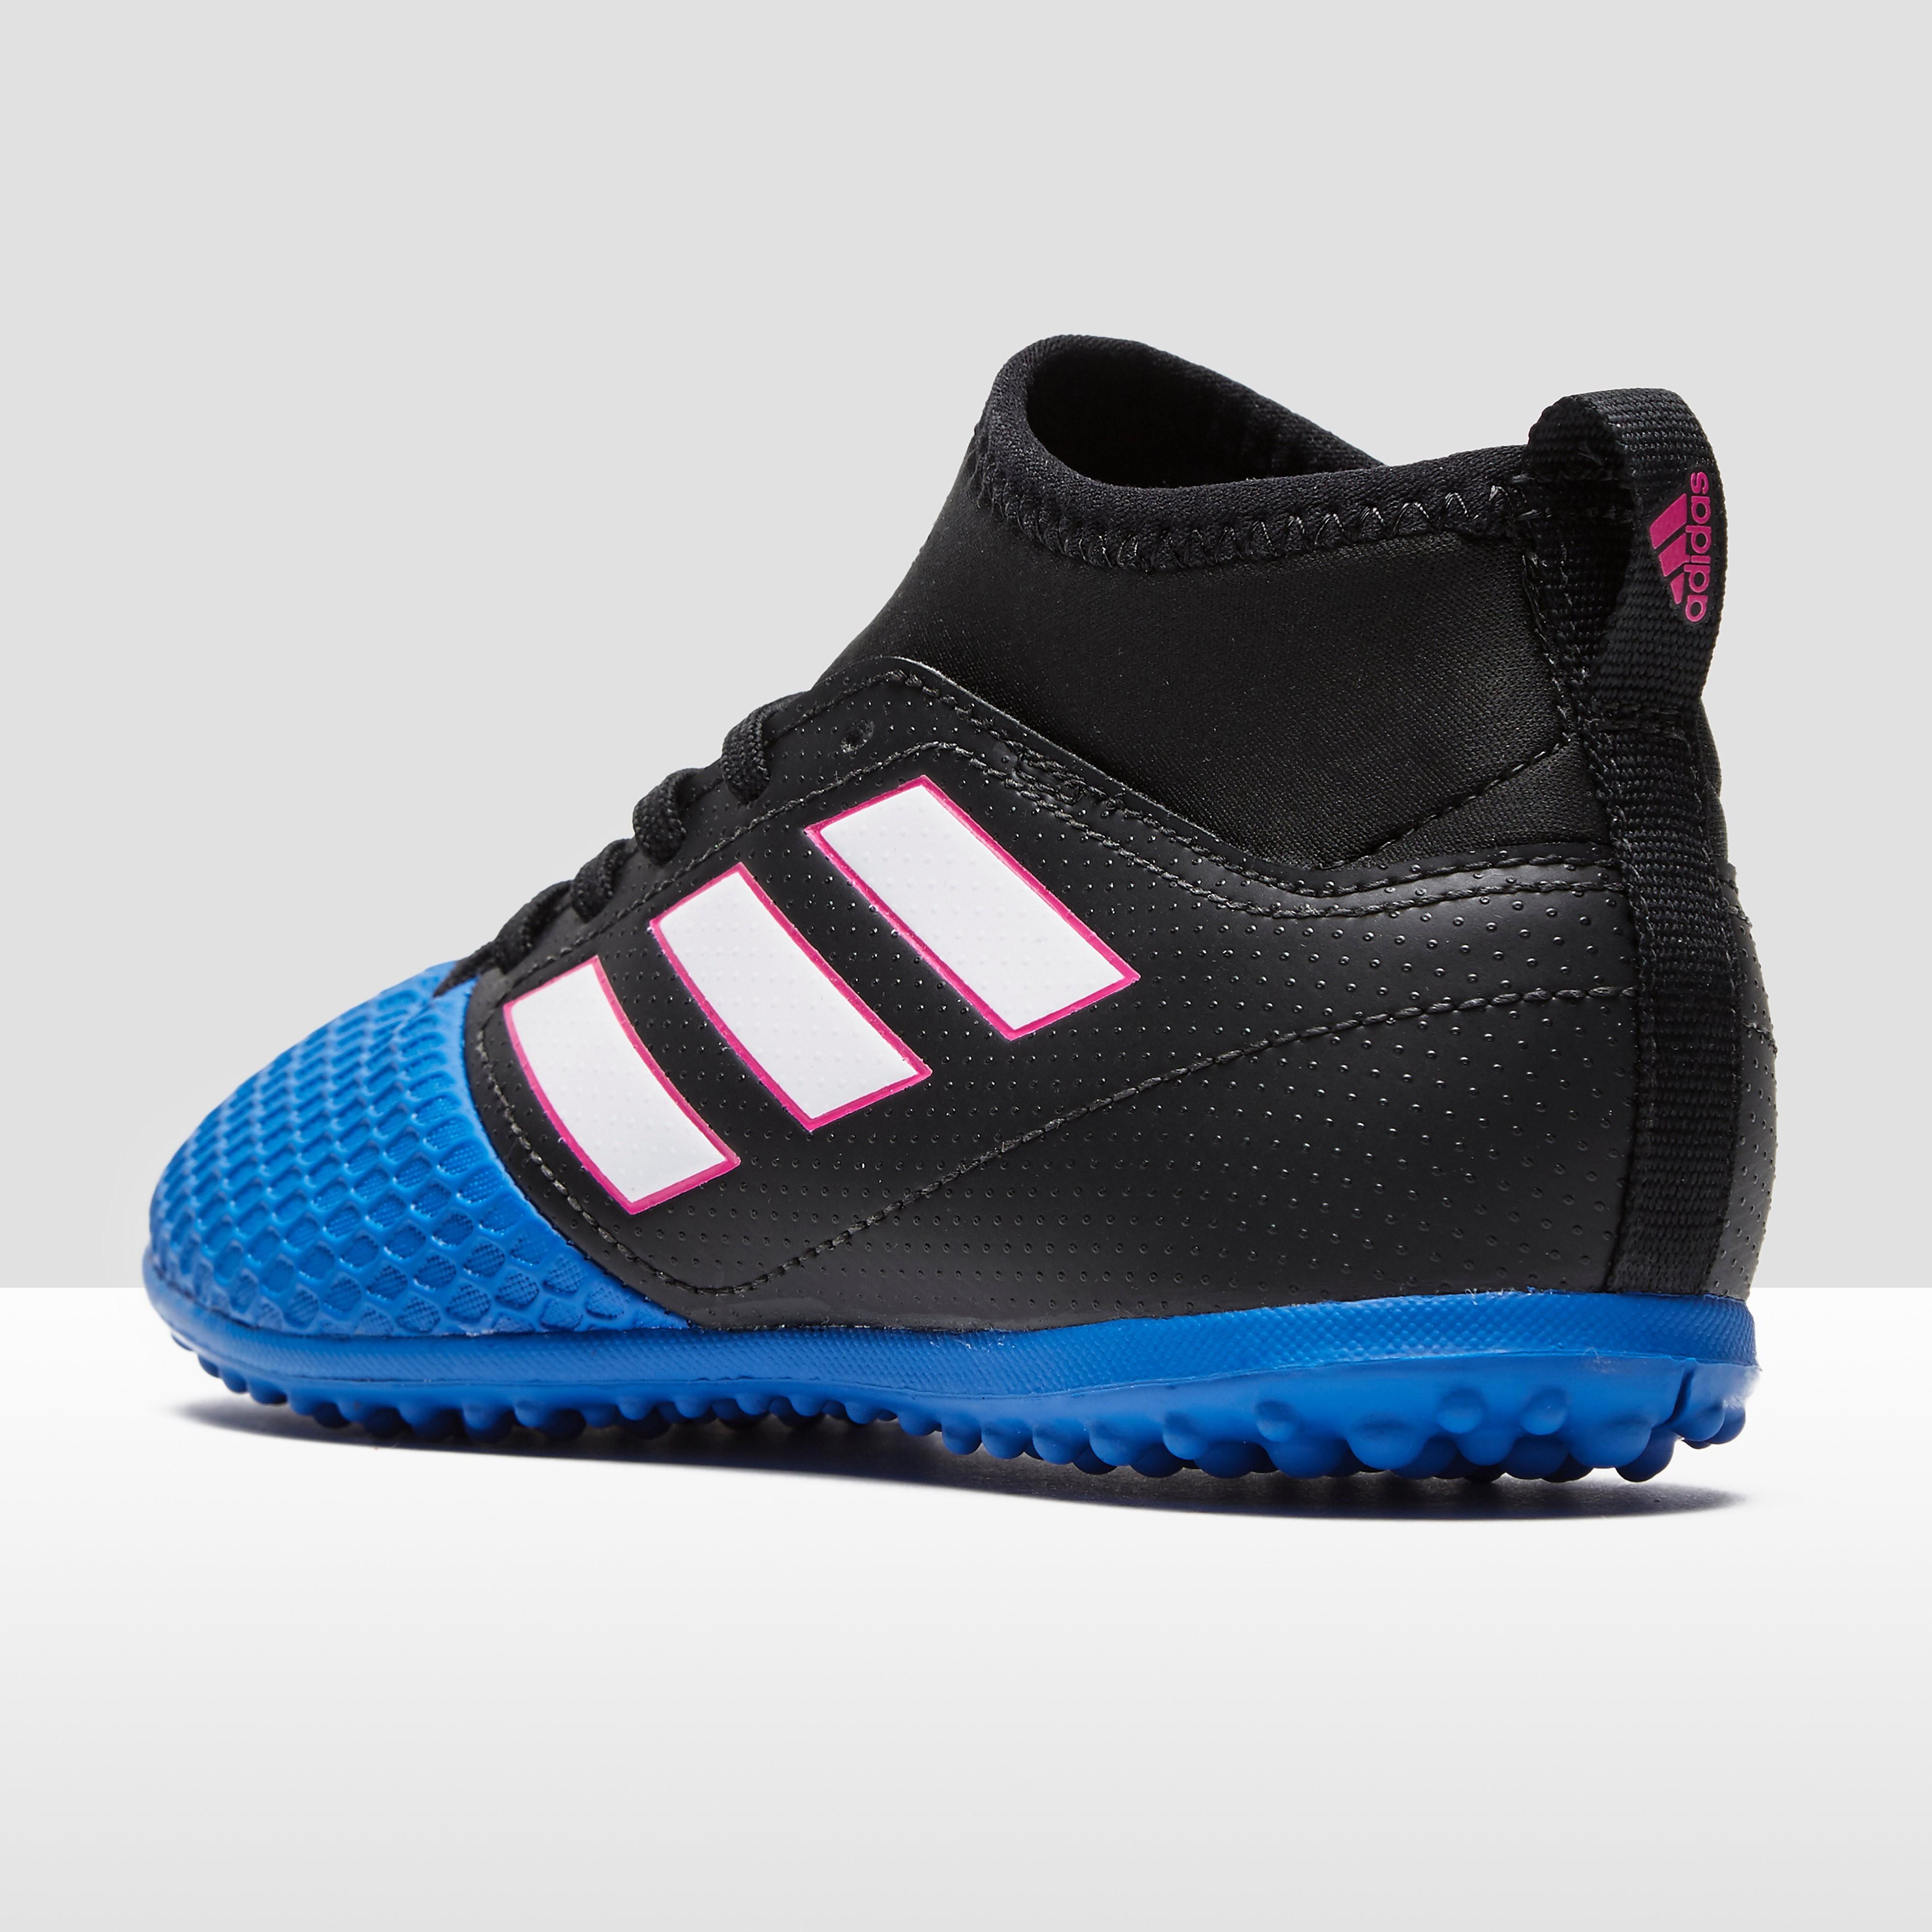 adidas Blue Blast Ace 17.3 Turf Children's Football Boots